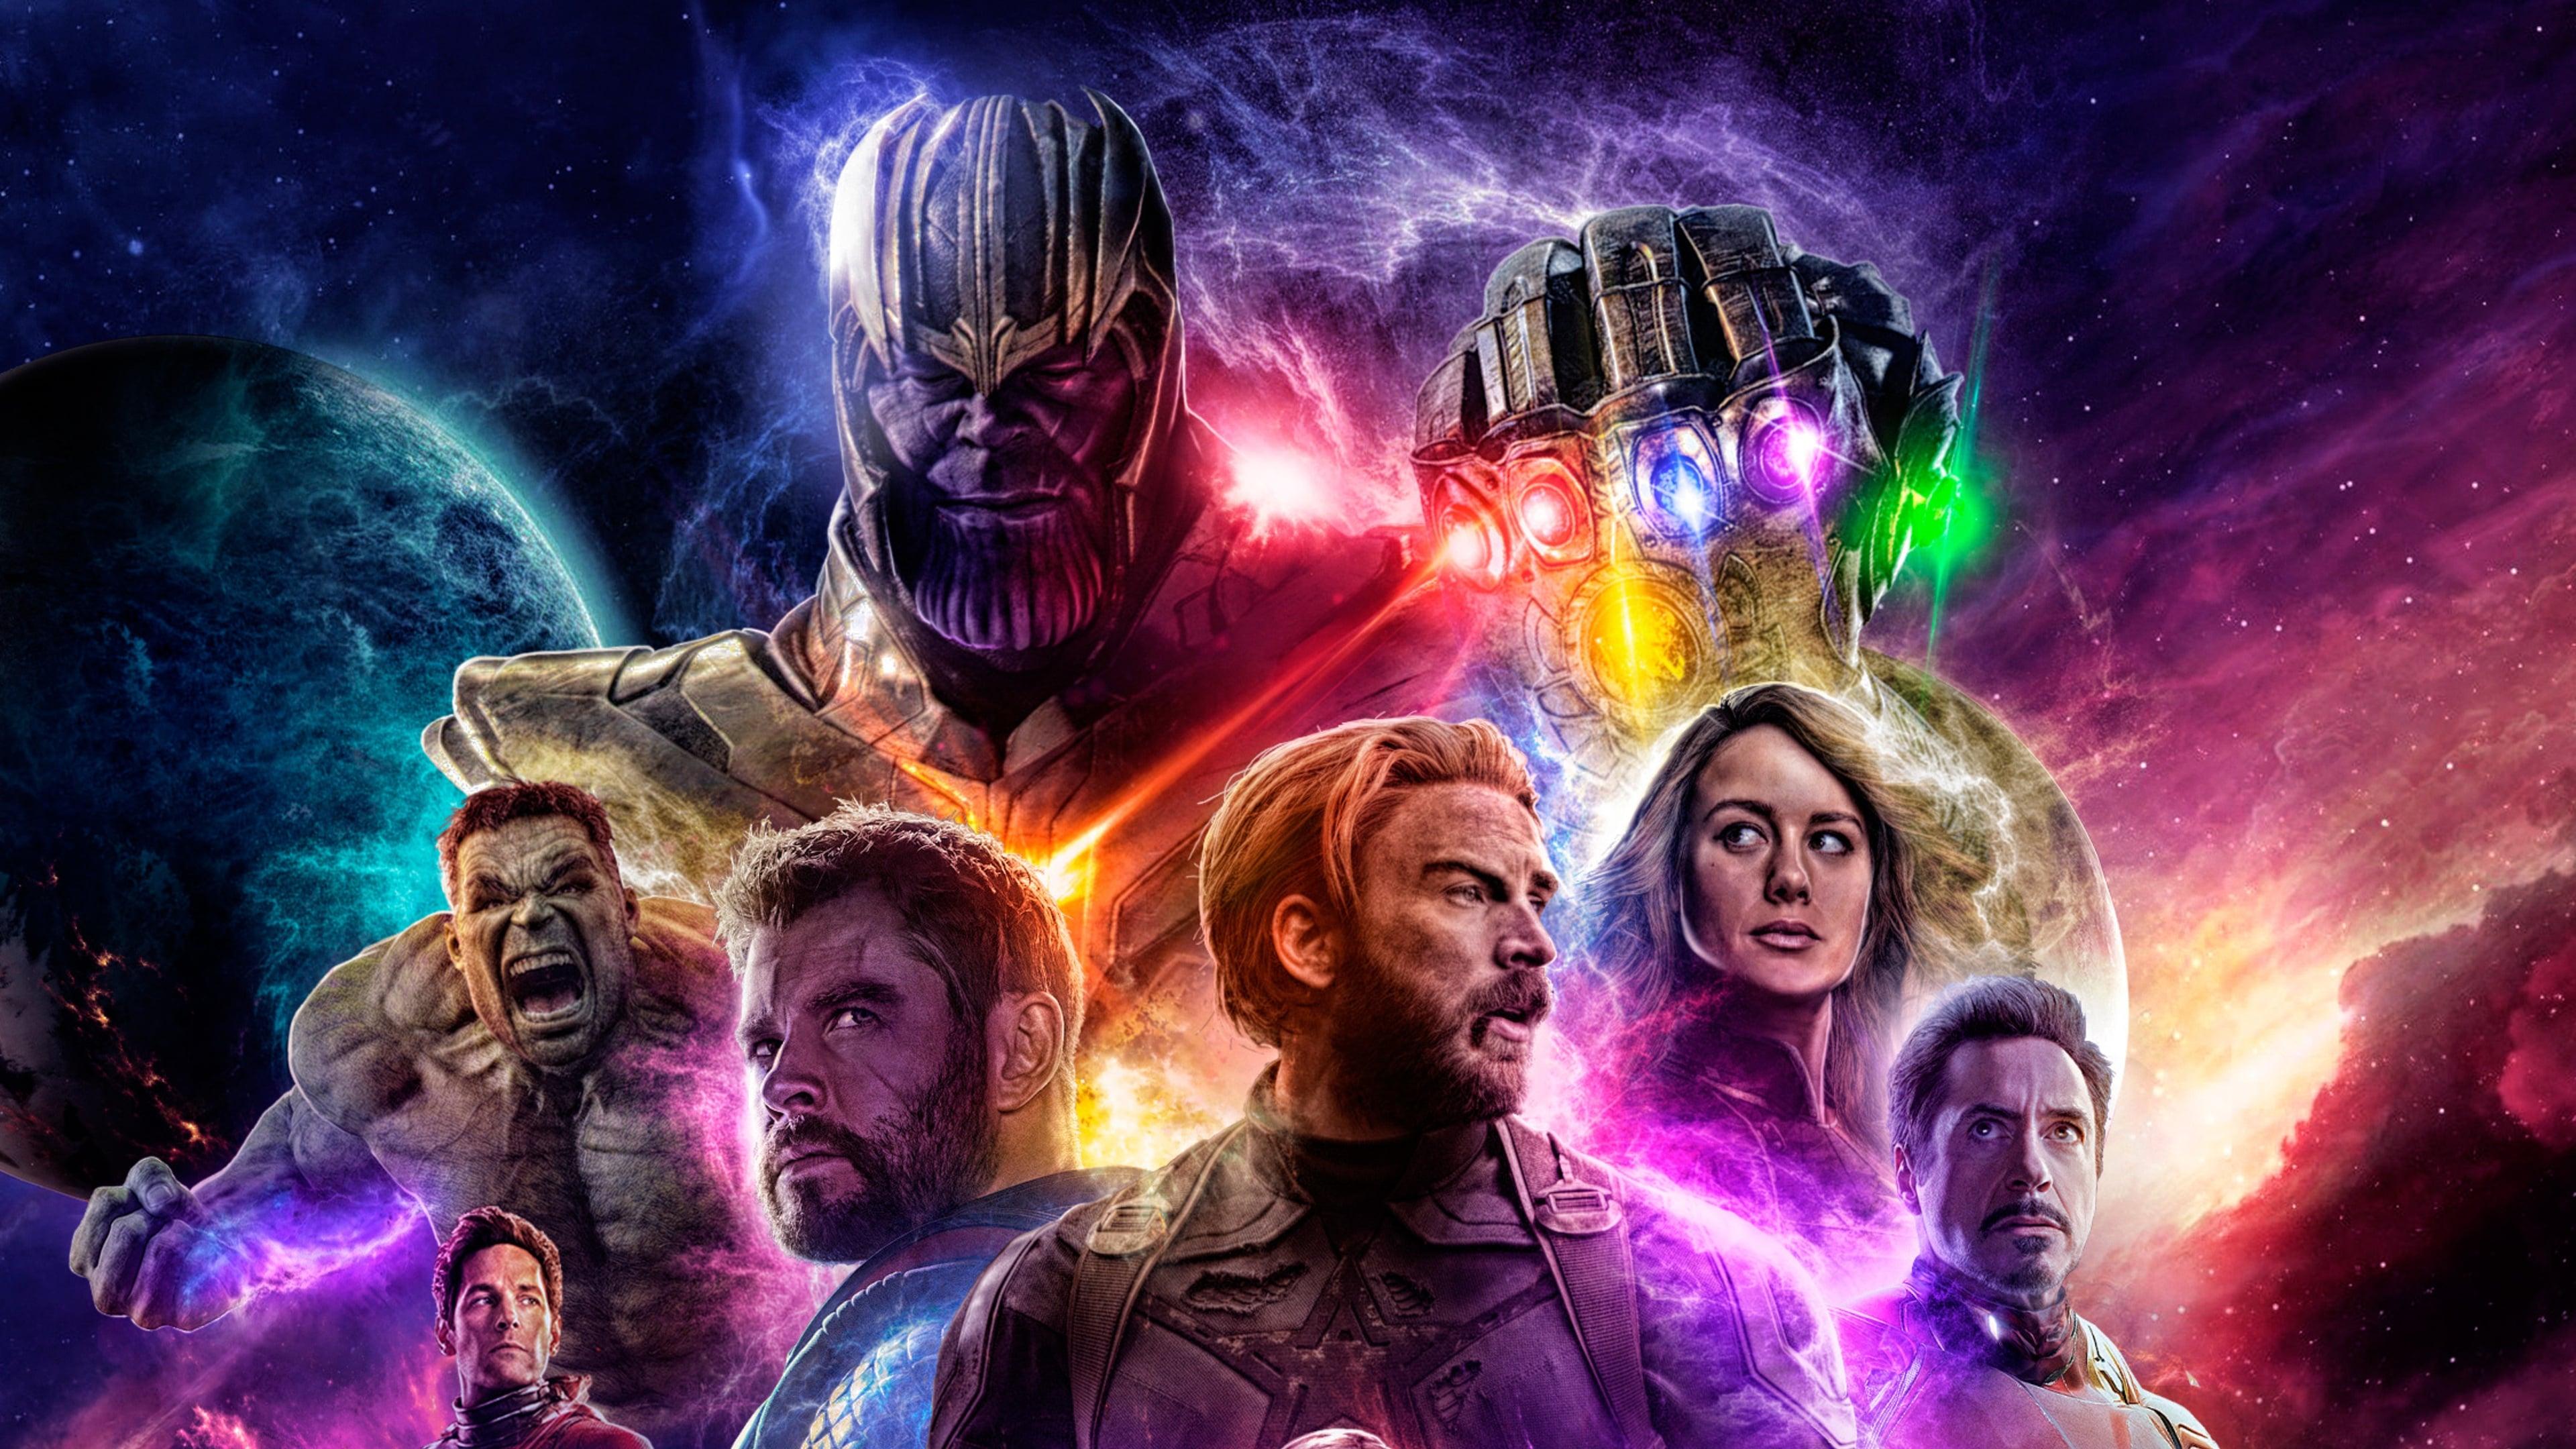 Photo extraite de The Avengers